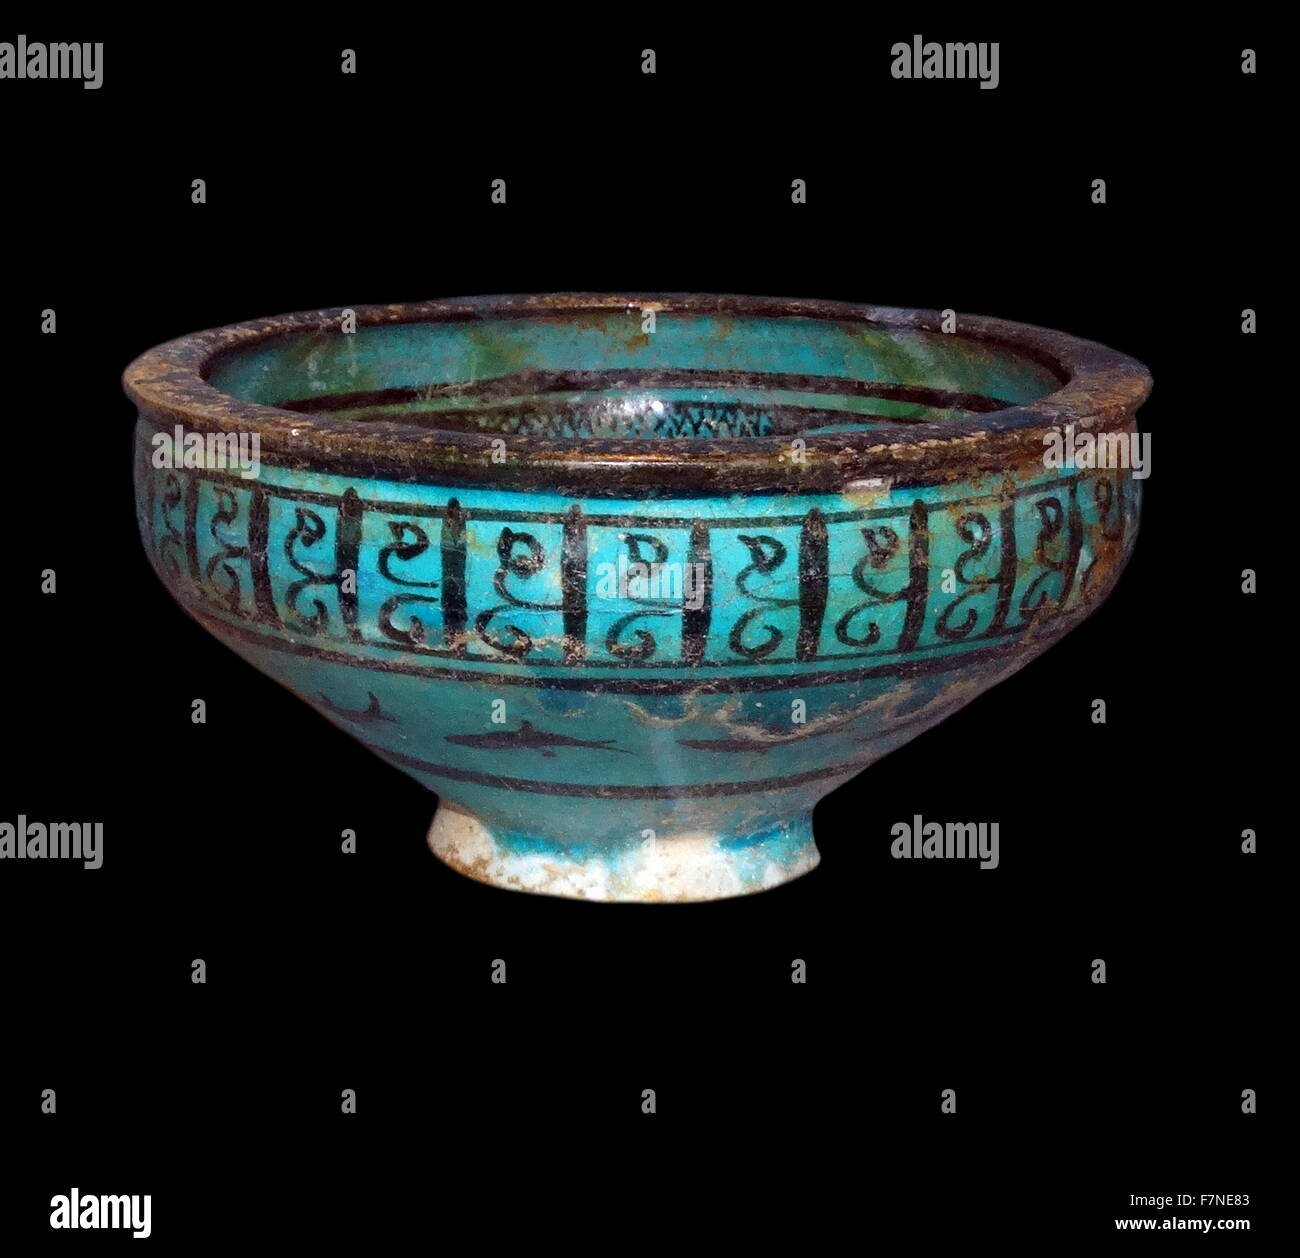 Glazed stonepaste bowl. Persian, Iran, AD 1400-1500 - Stock Image